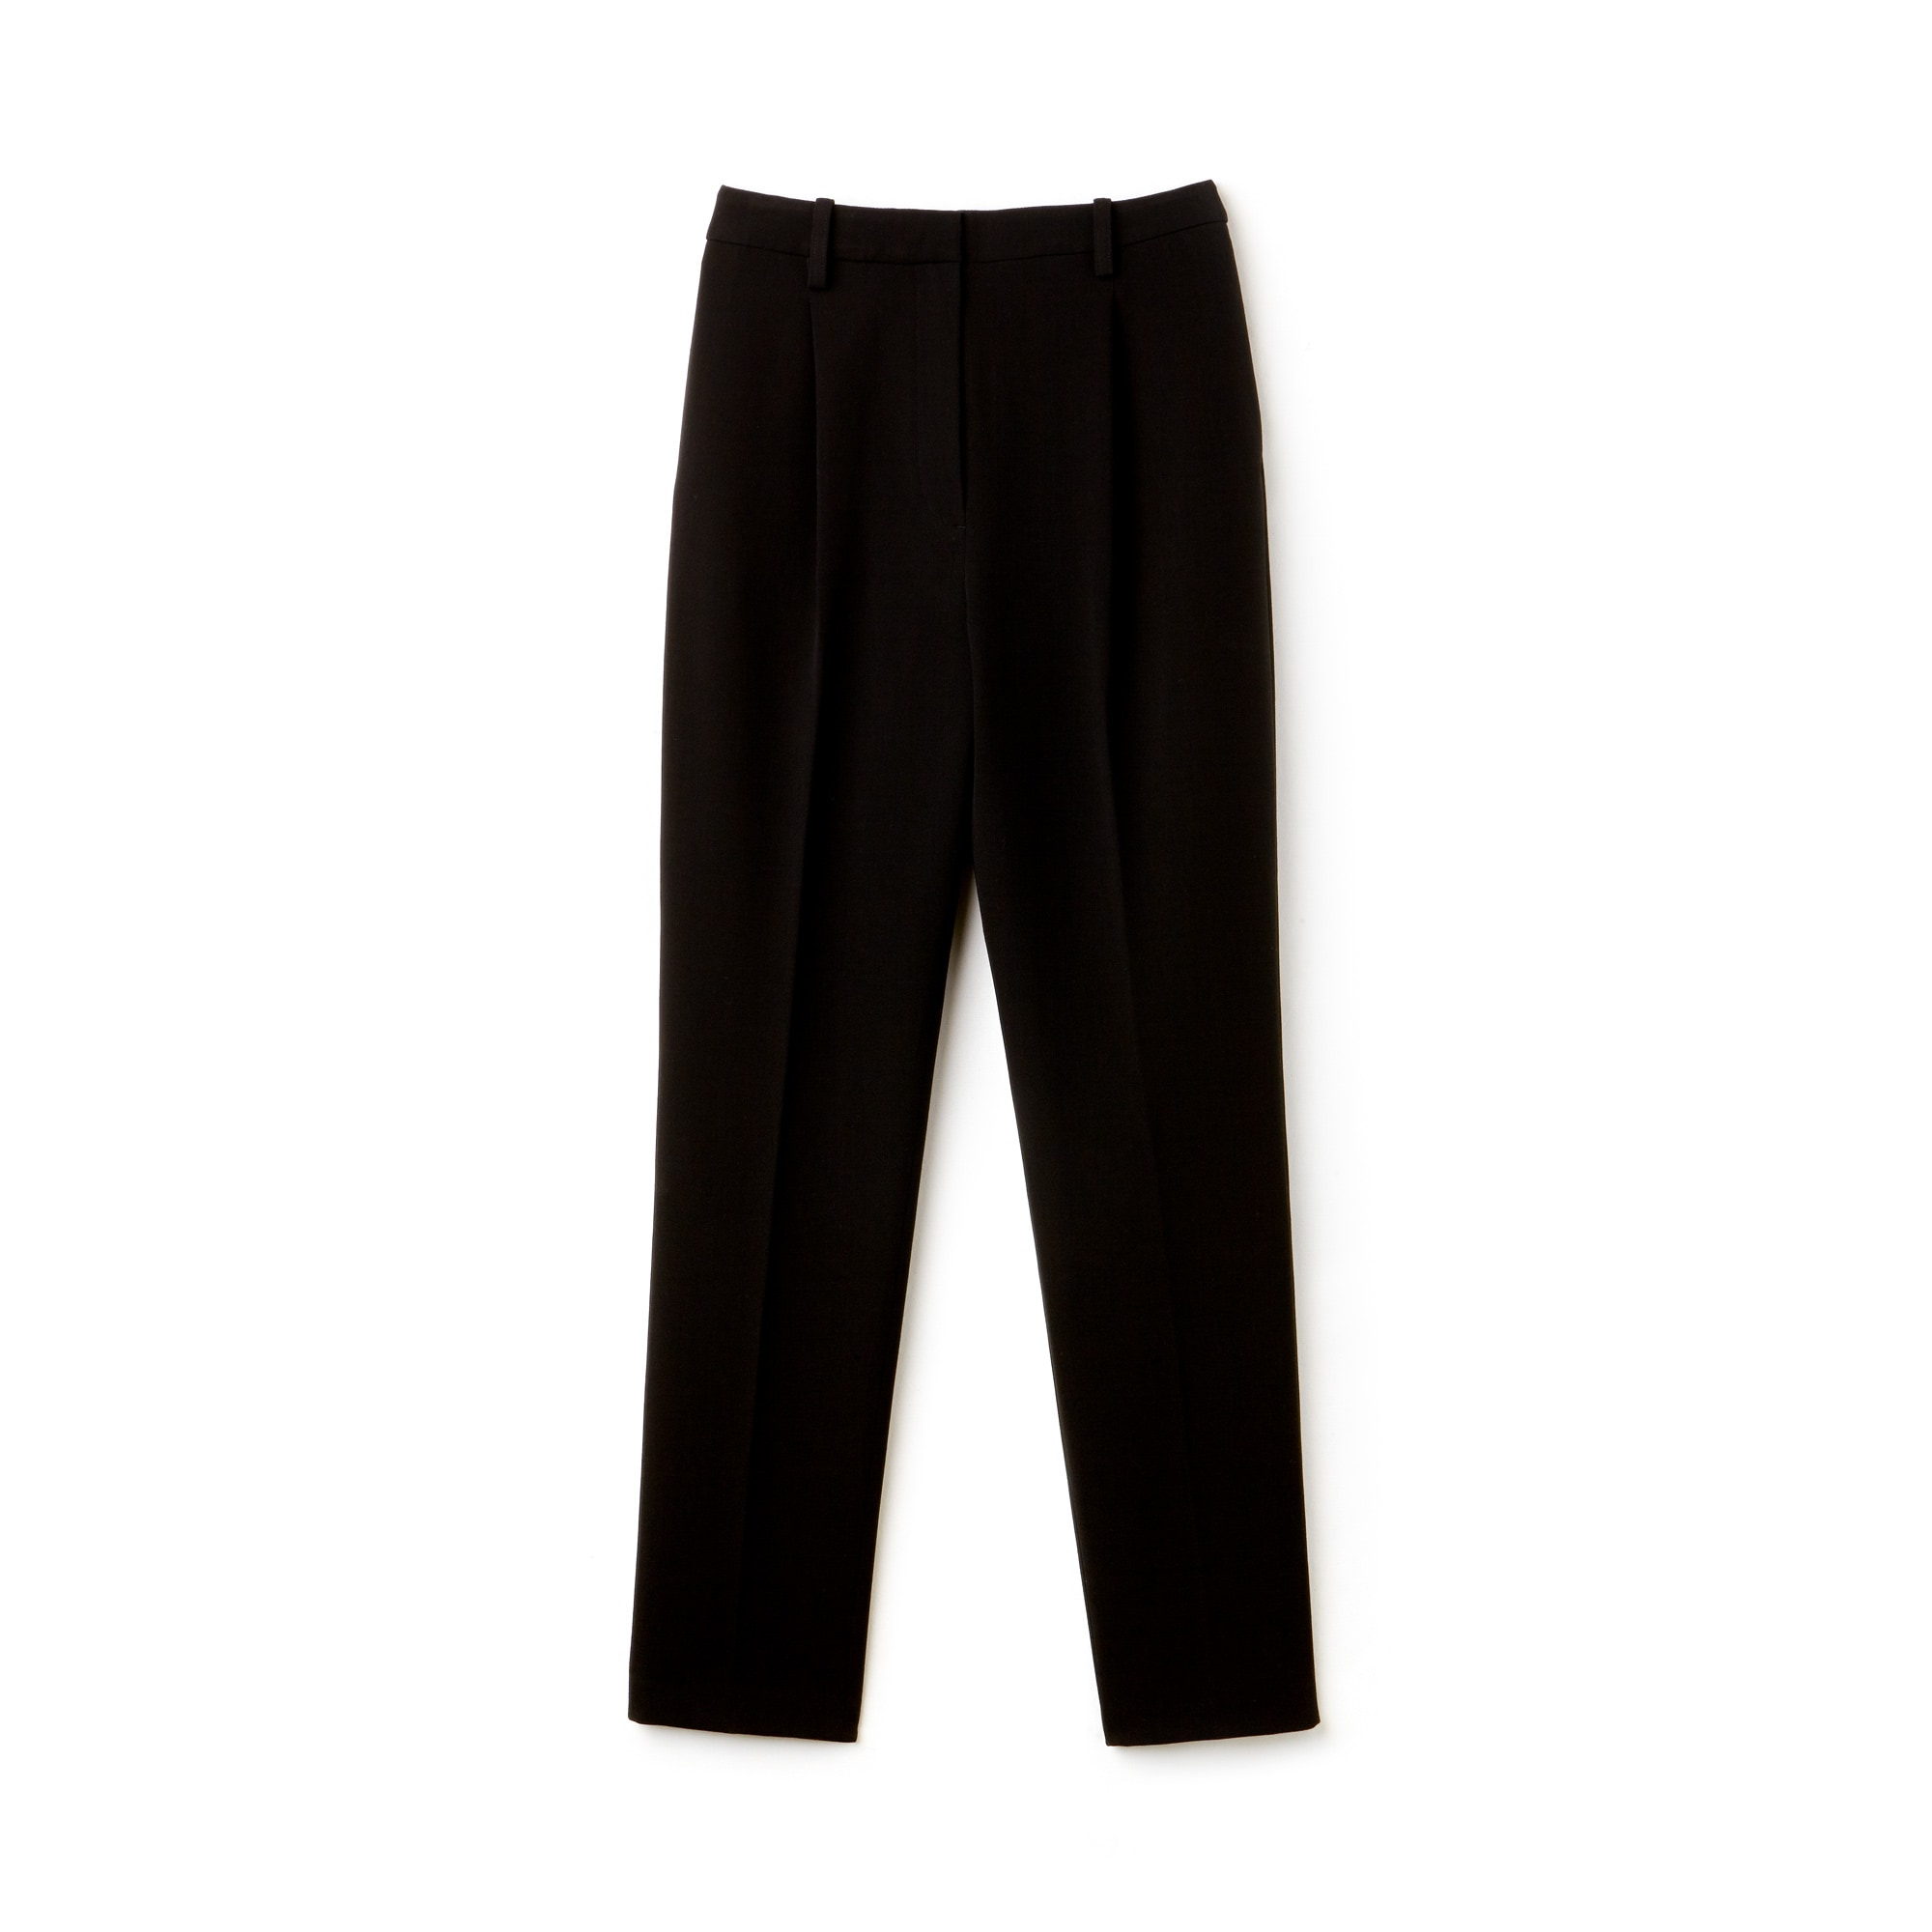 Women's Slim Fit Stretch Cotton Gabardine Carrot Pants